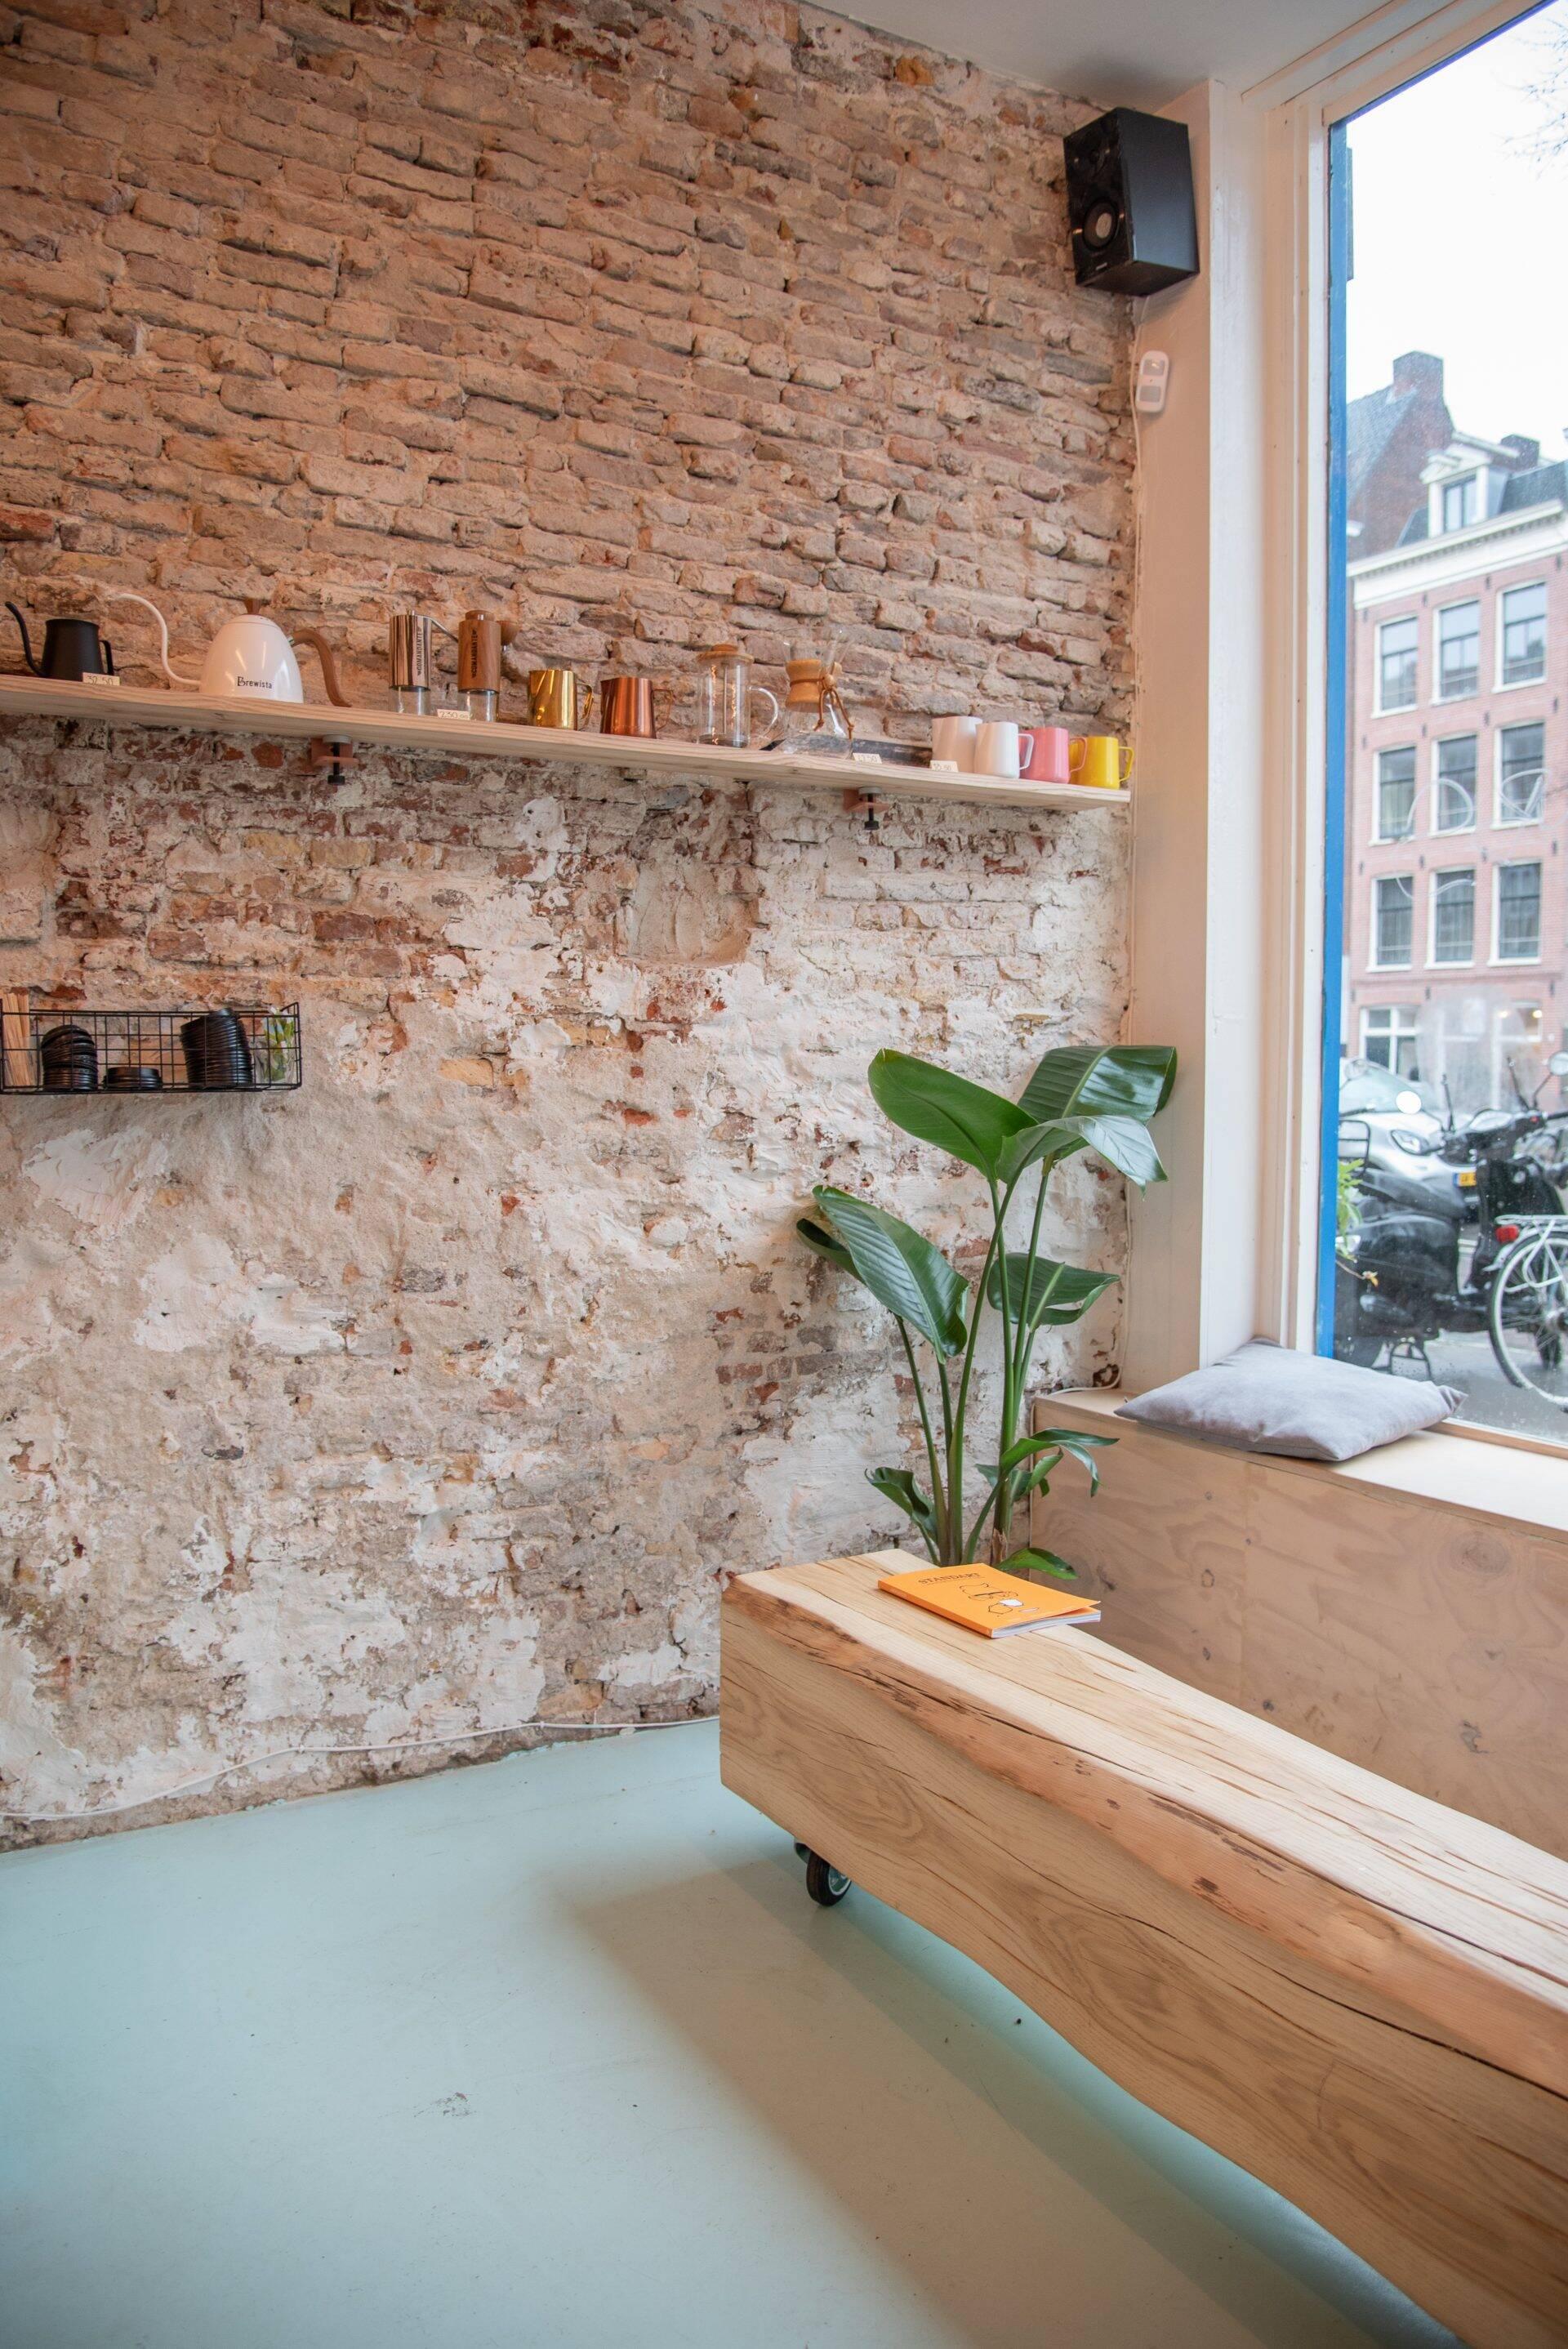 Koffiebar Amsterdam - Rum Baba